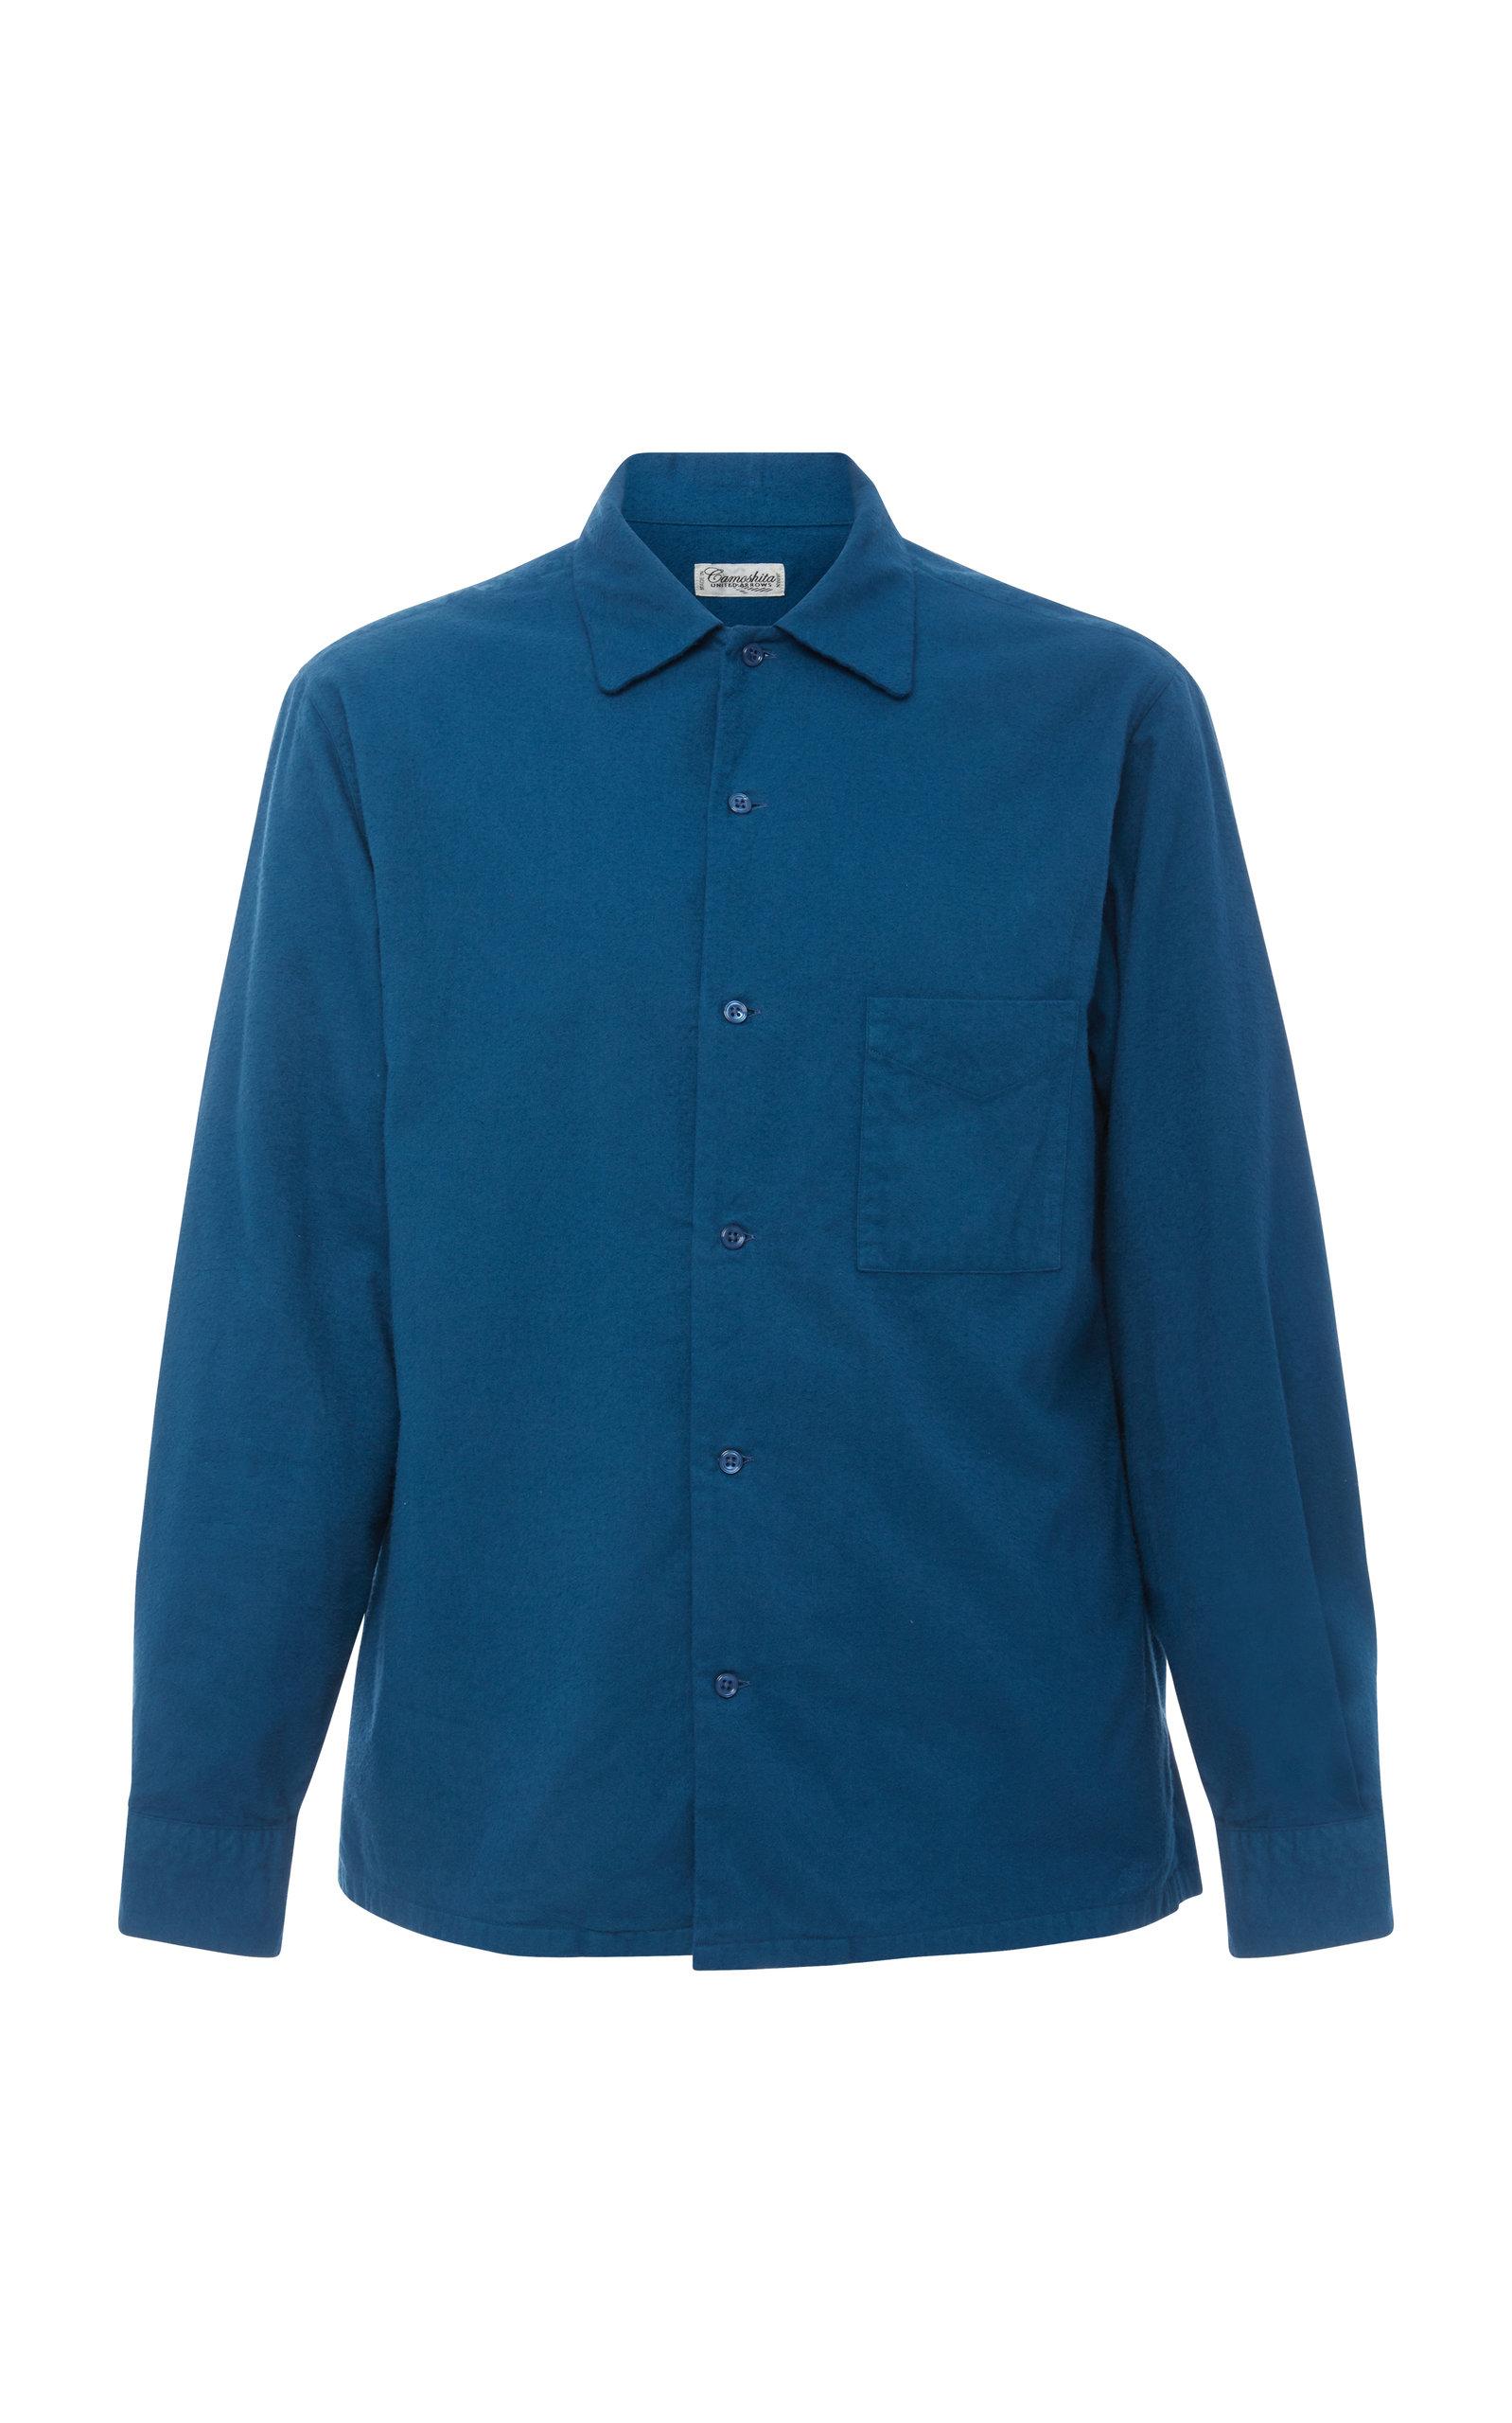 CAMOSHITA Open Collar Button Shirt in Blue